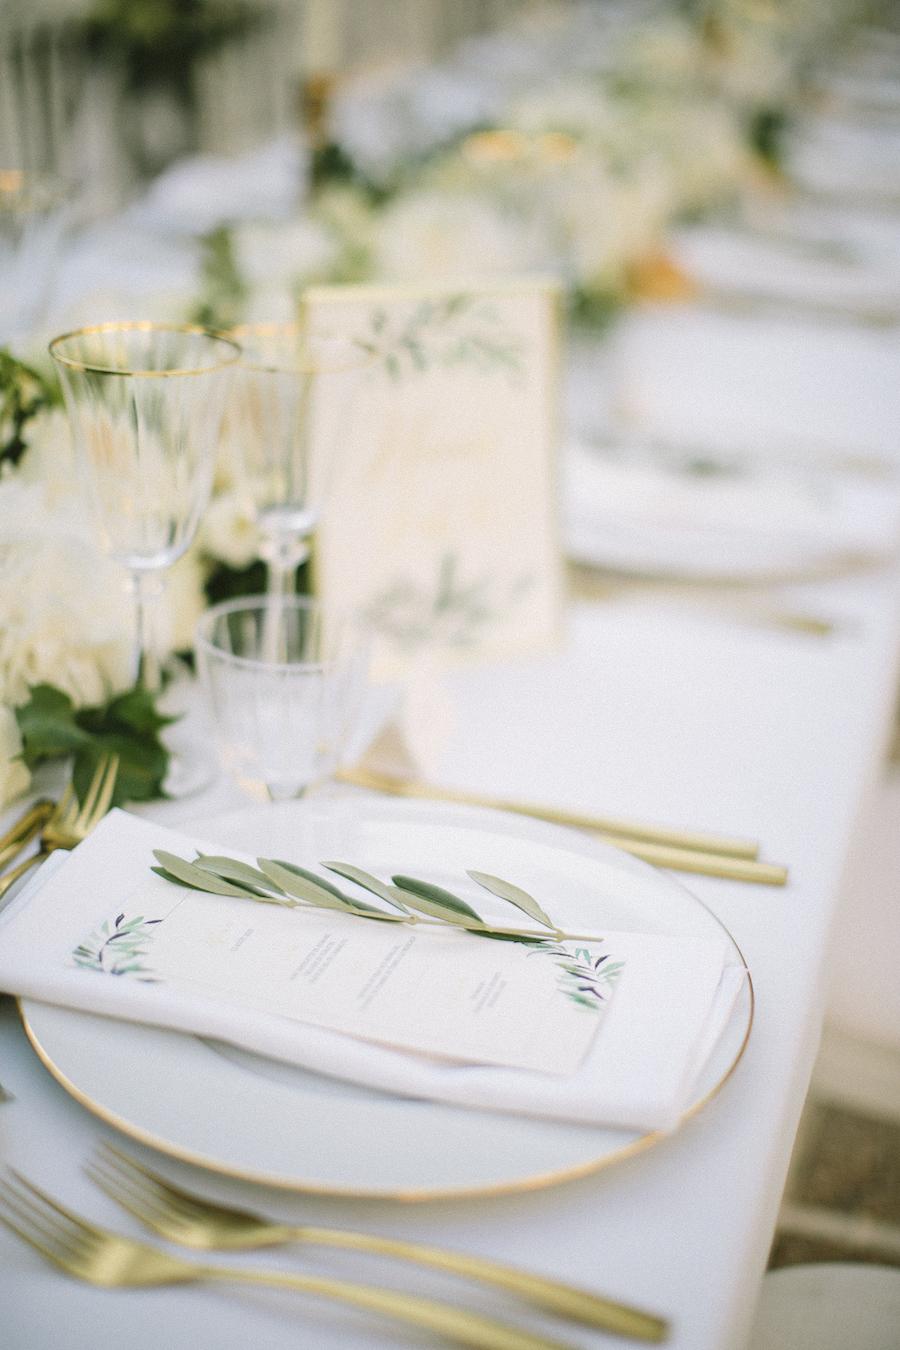 saya-photography-wedding-photographer-provence-chateau-de-robernier-100.jpg